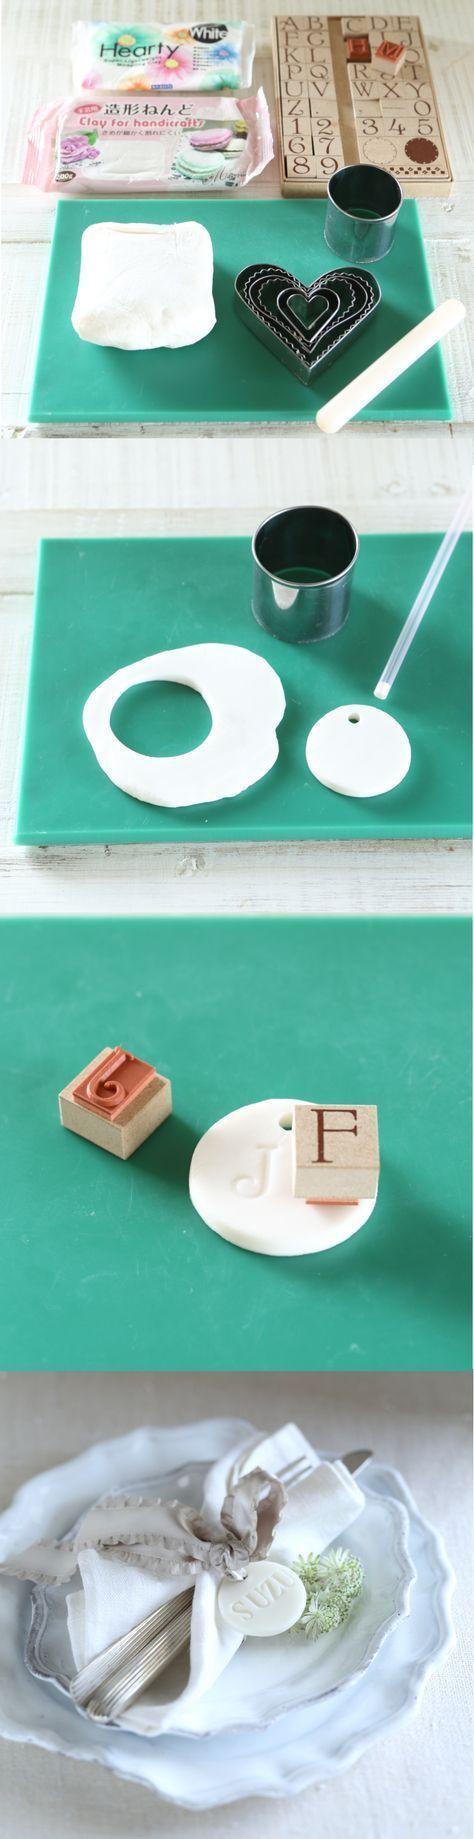 [DIY]粘土で作る陶器みたいなネームプレート 粘土+スタンプで作るネームプレート(席札)。クッキー型で粘土を抜いて、ゲストのイニシャルや名前をスタンプすれば完成する簡単な手順ながら、仕上がりは陶器のような高級感ある印象に。席札以外にも「ENJOY」や「LOVE」など可愛い言葉をスタンプして、ギフトにアクセントとして飾ったり、会場ディスプレーのオーナメントとして使うのも◎